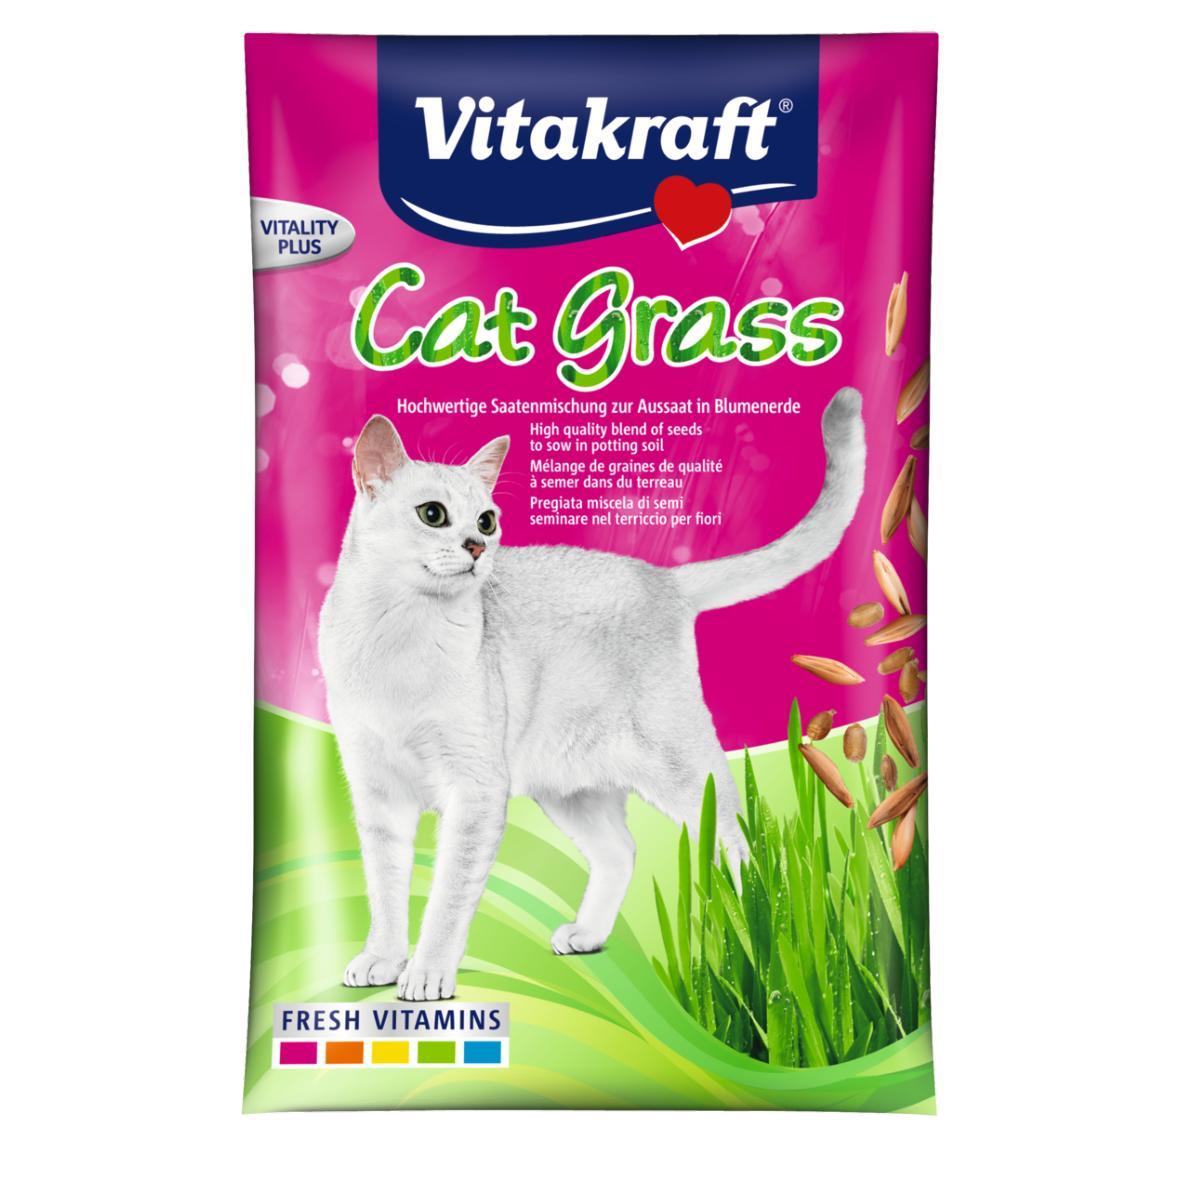 Vitakraft Cat Grass Refill Seeds 50gm